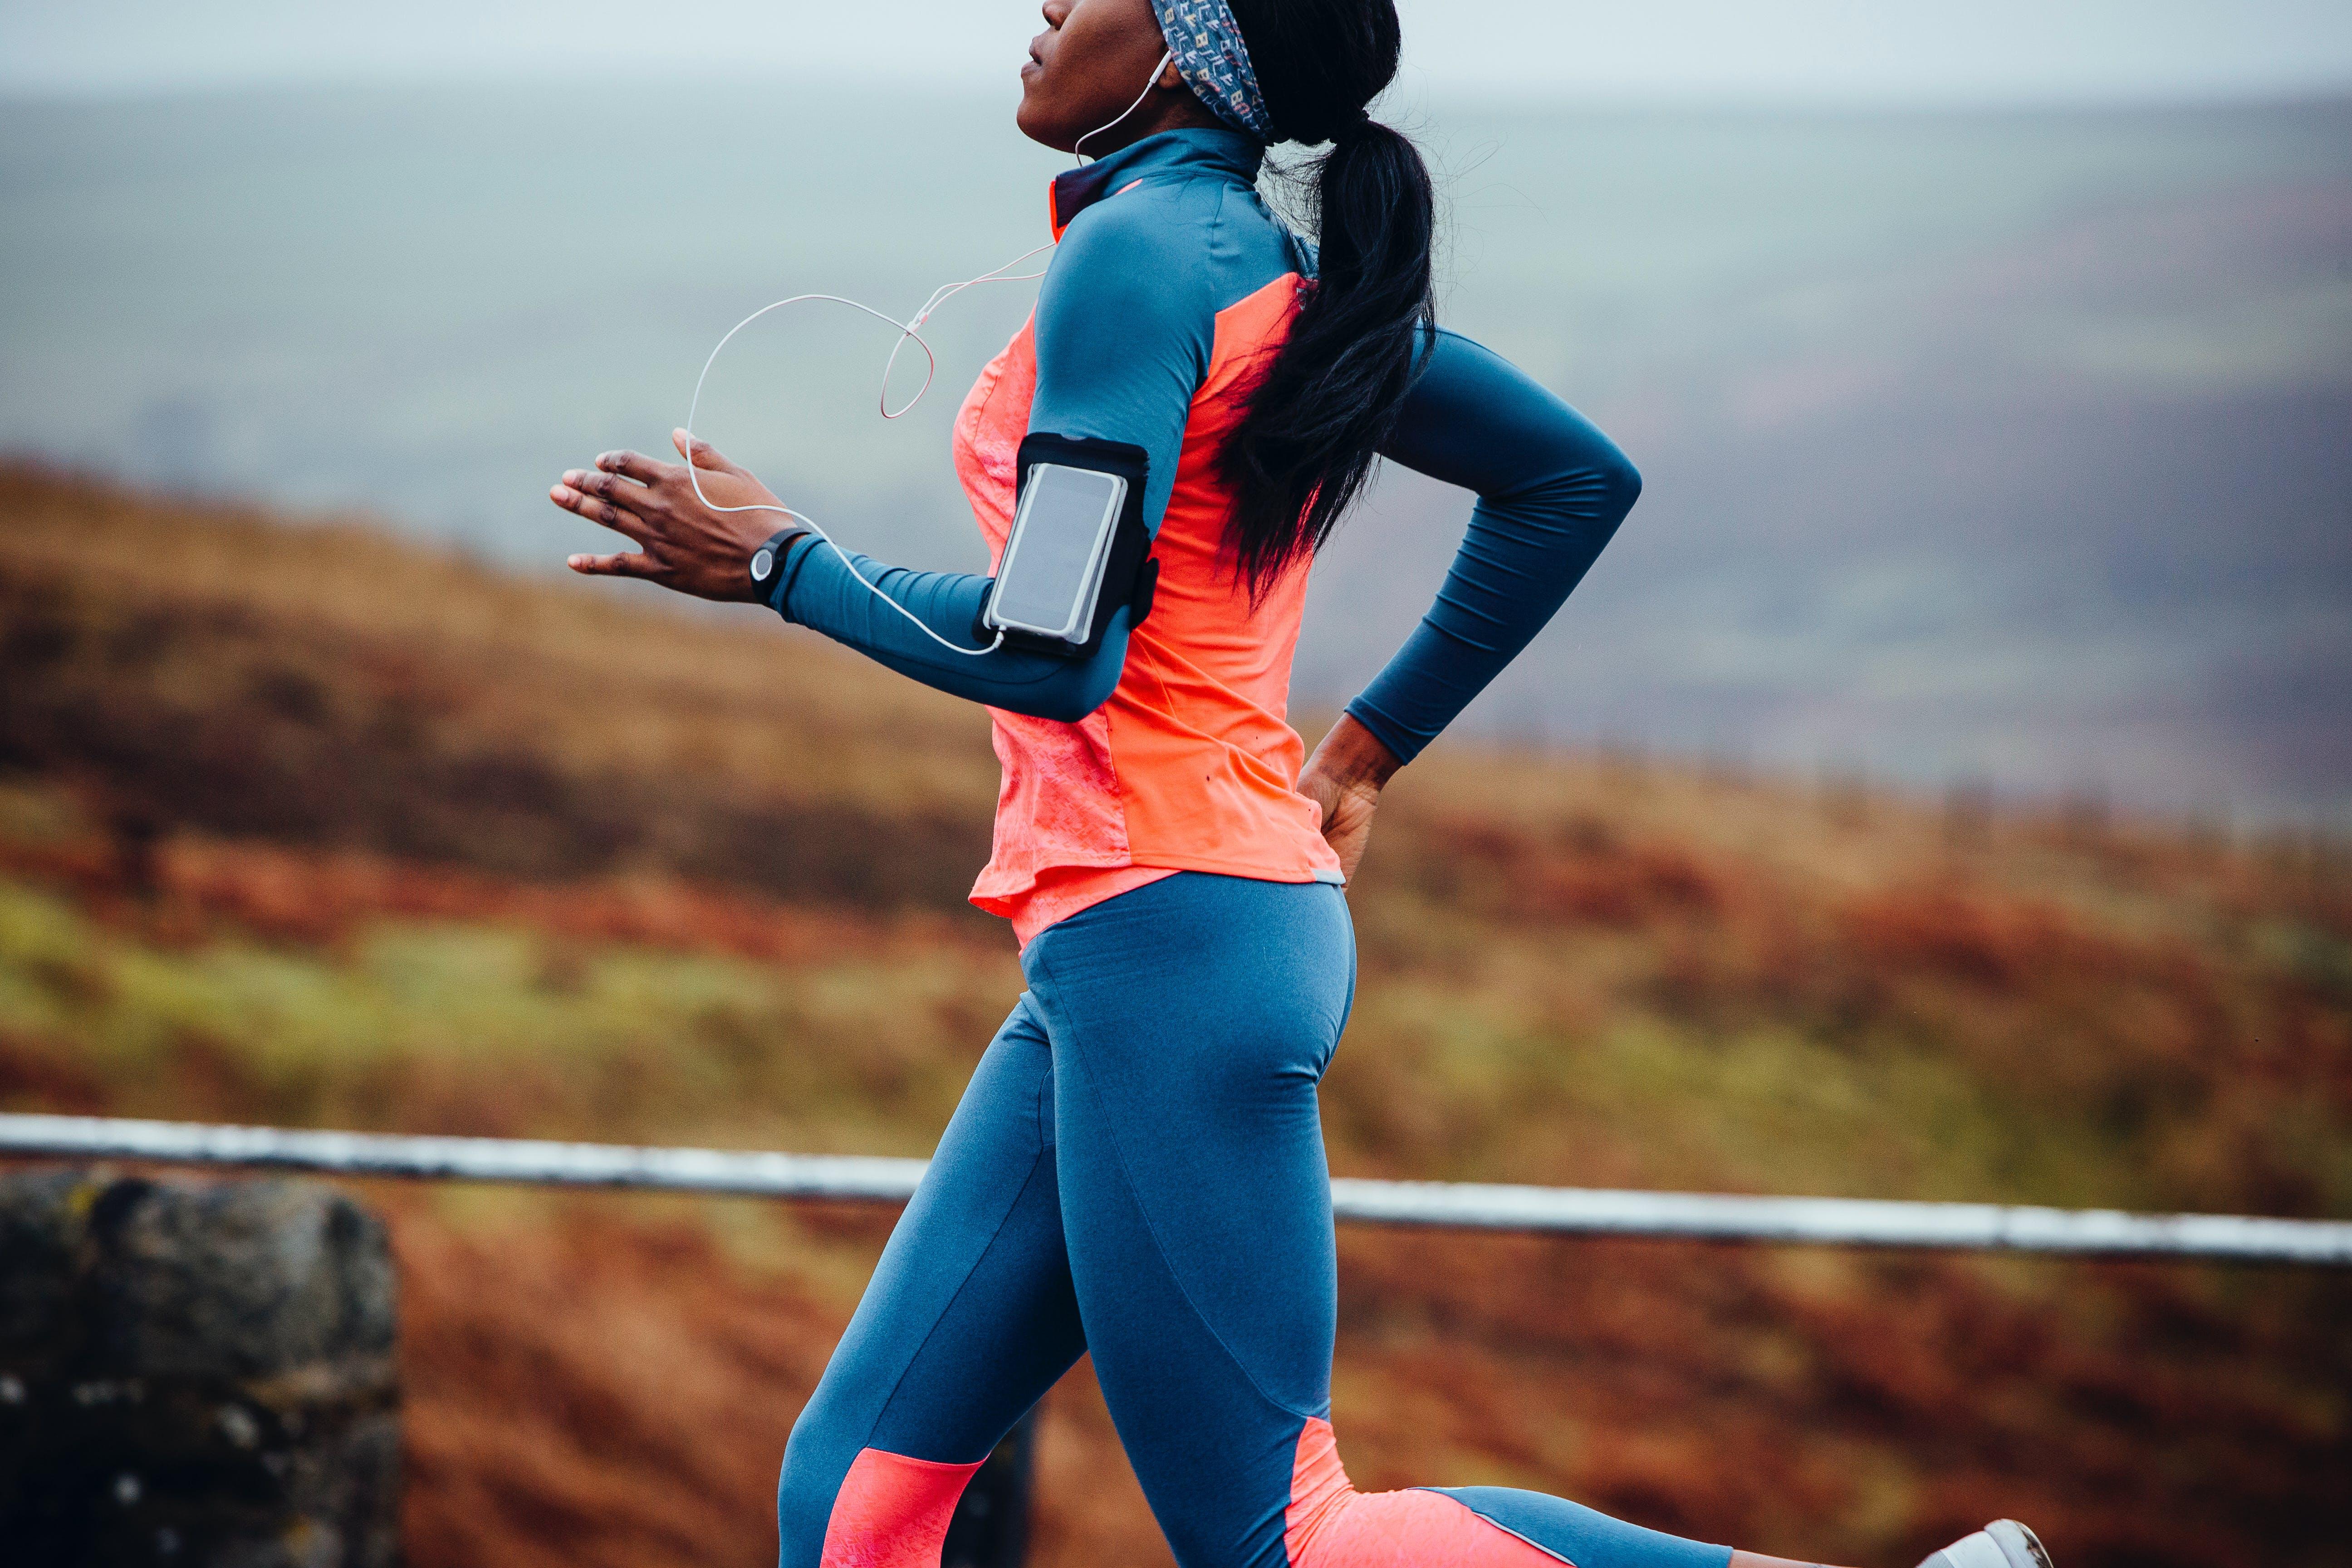 test all your gear first marathon advice